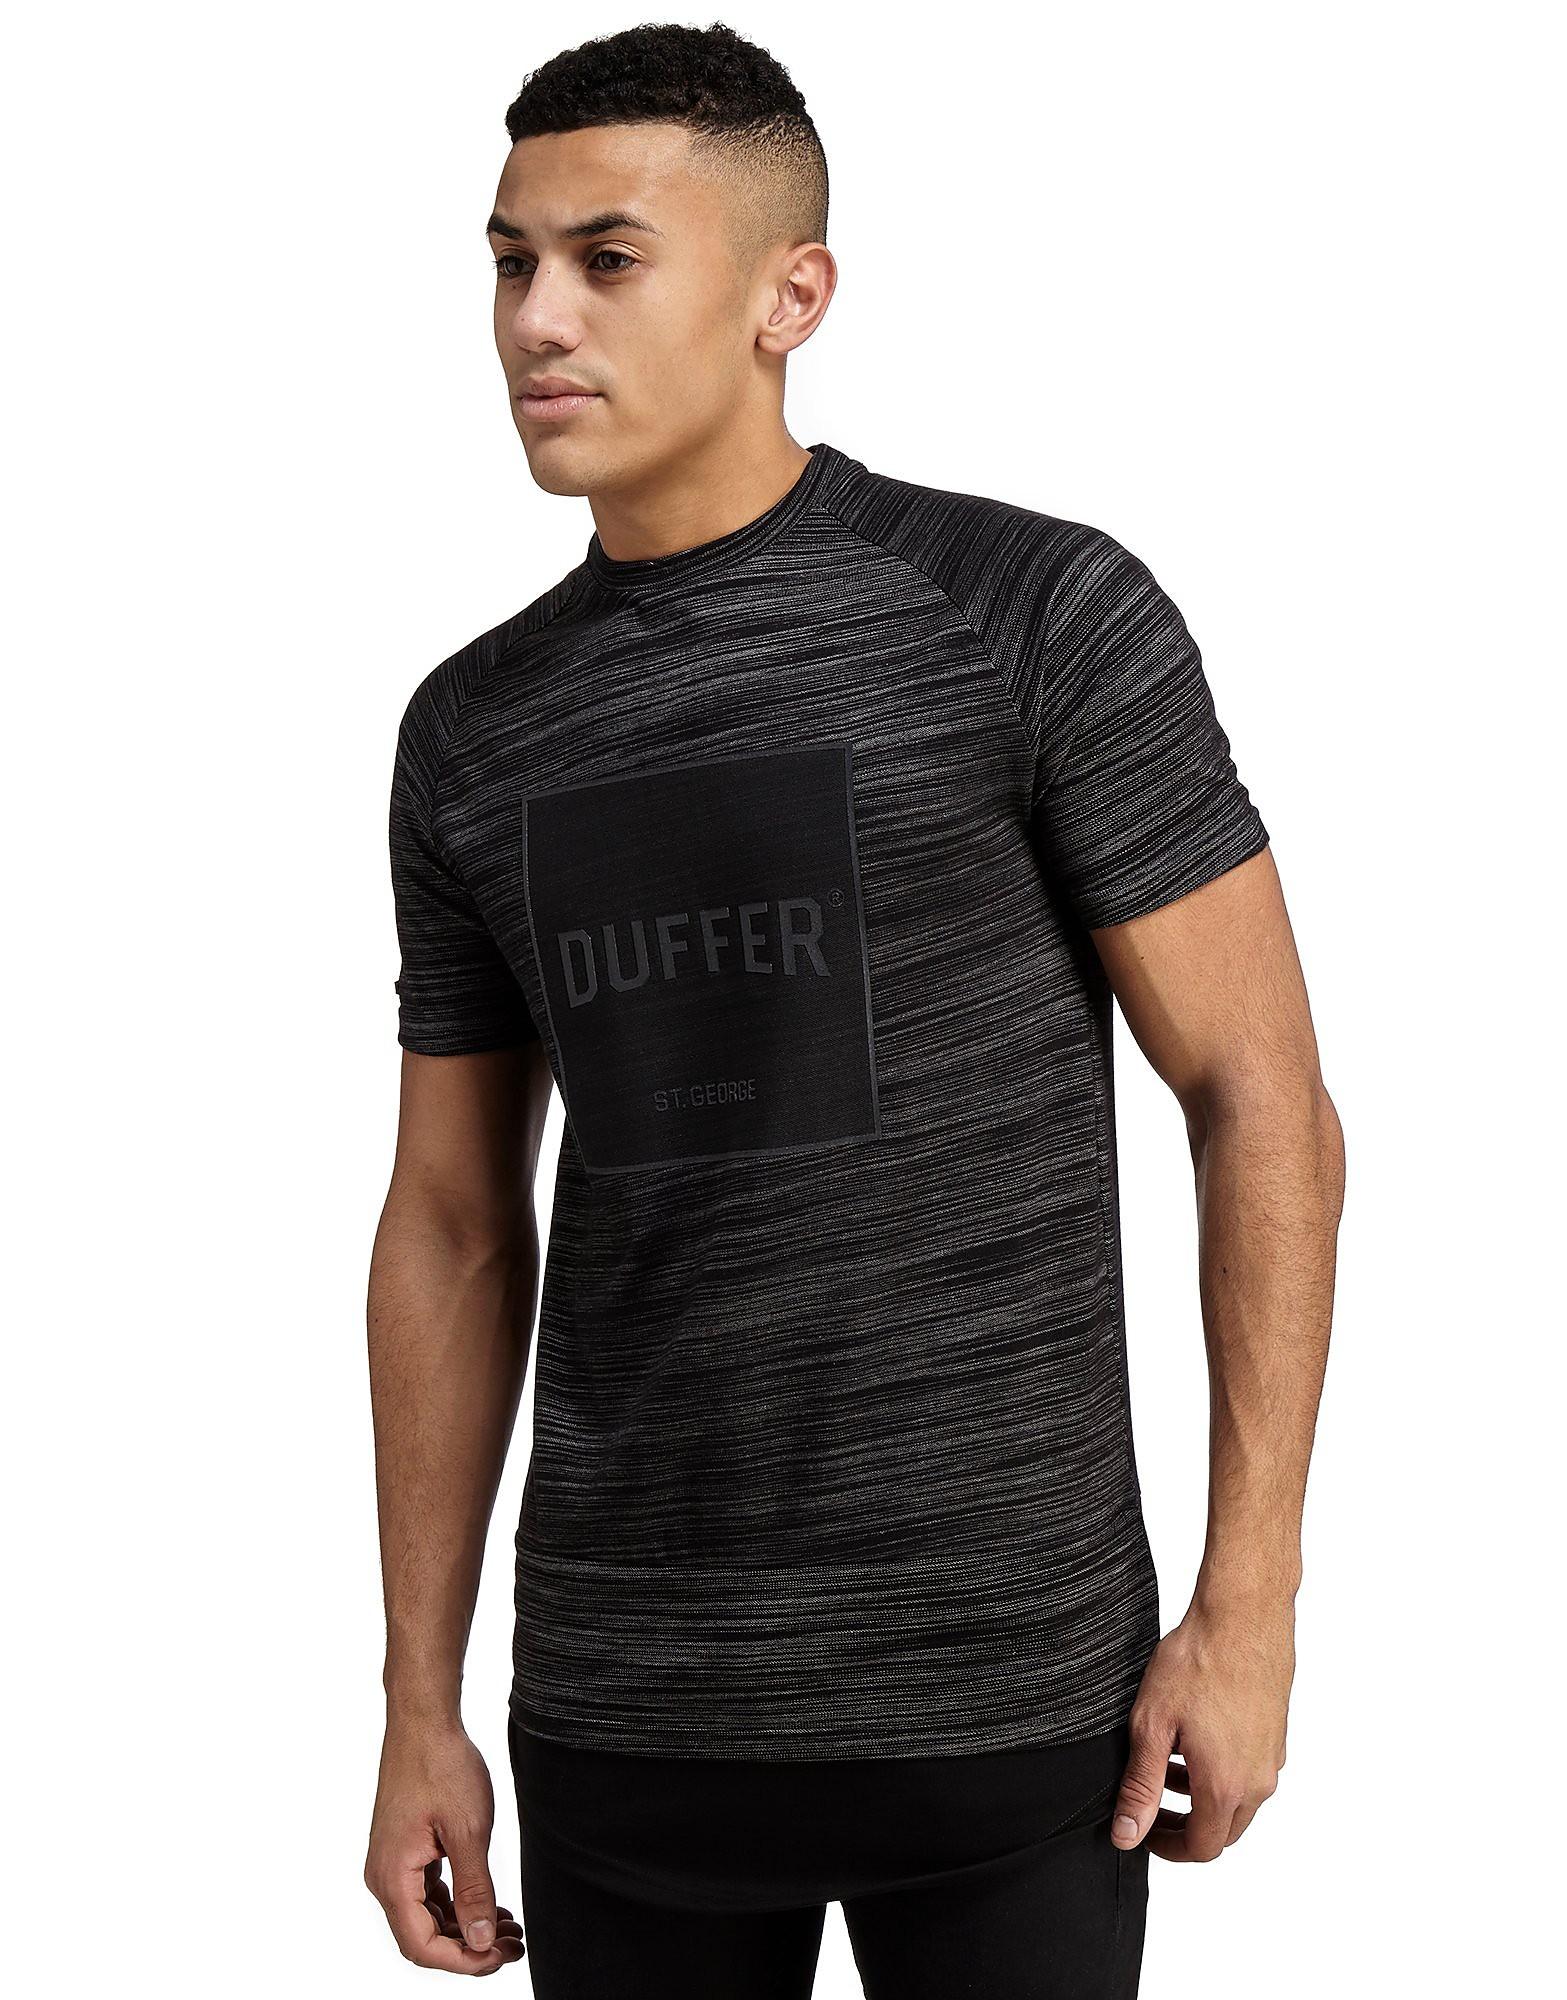 Duffer of St George Webley T-Shirt